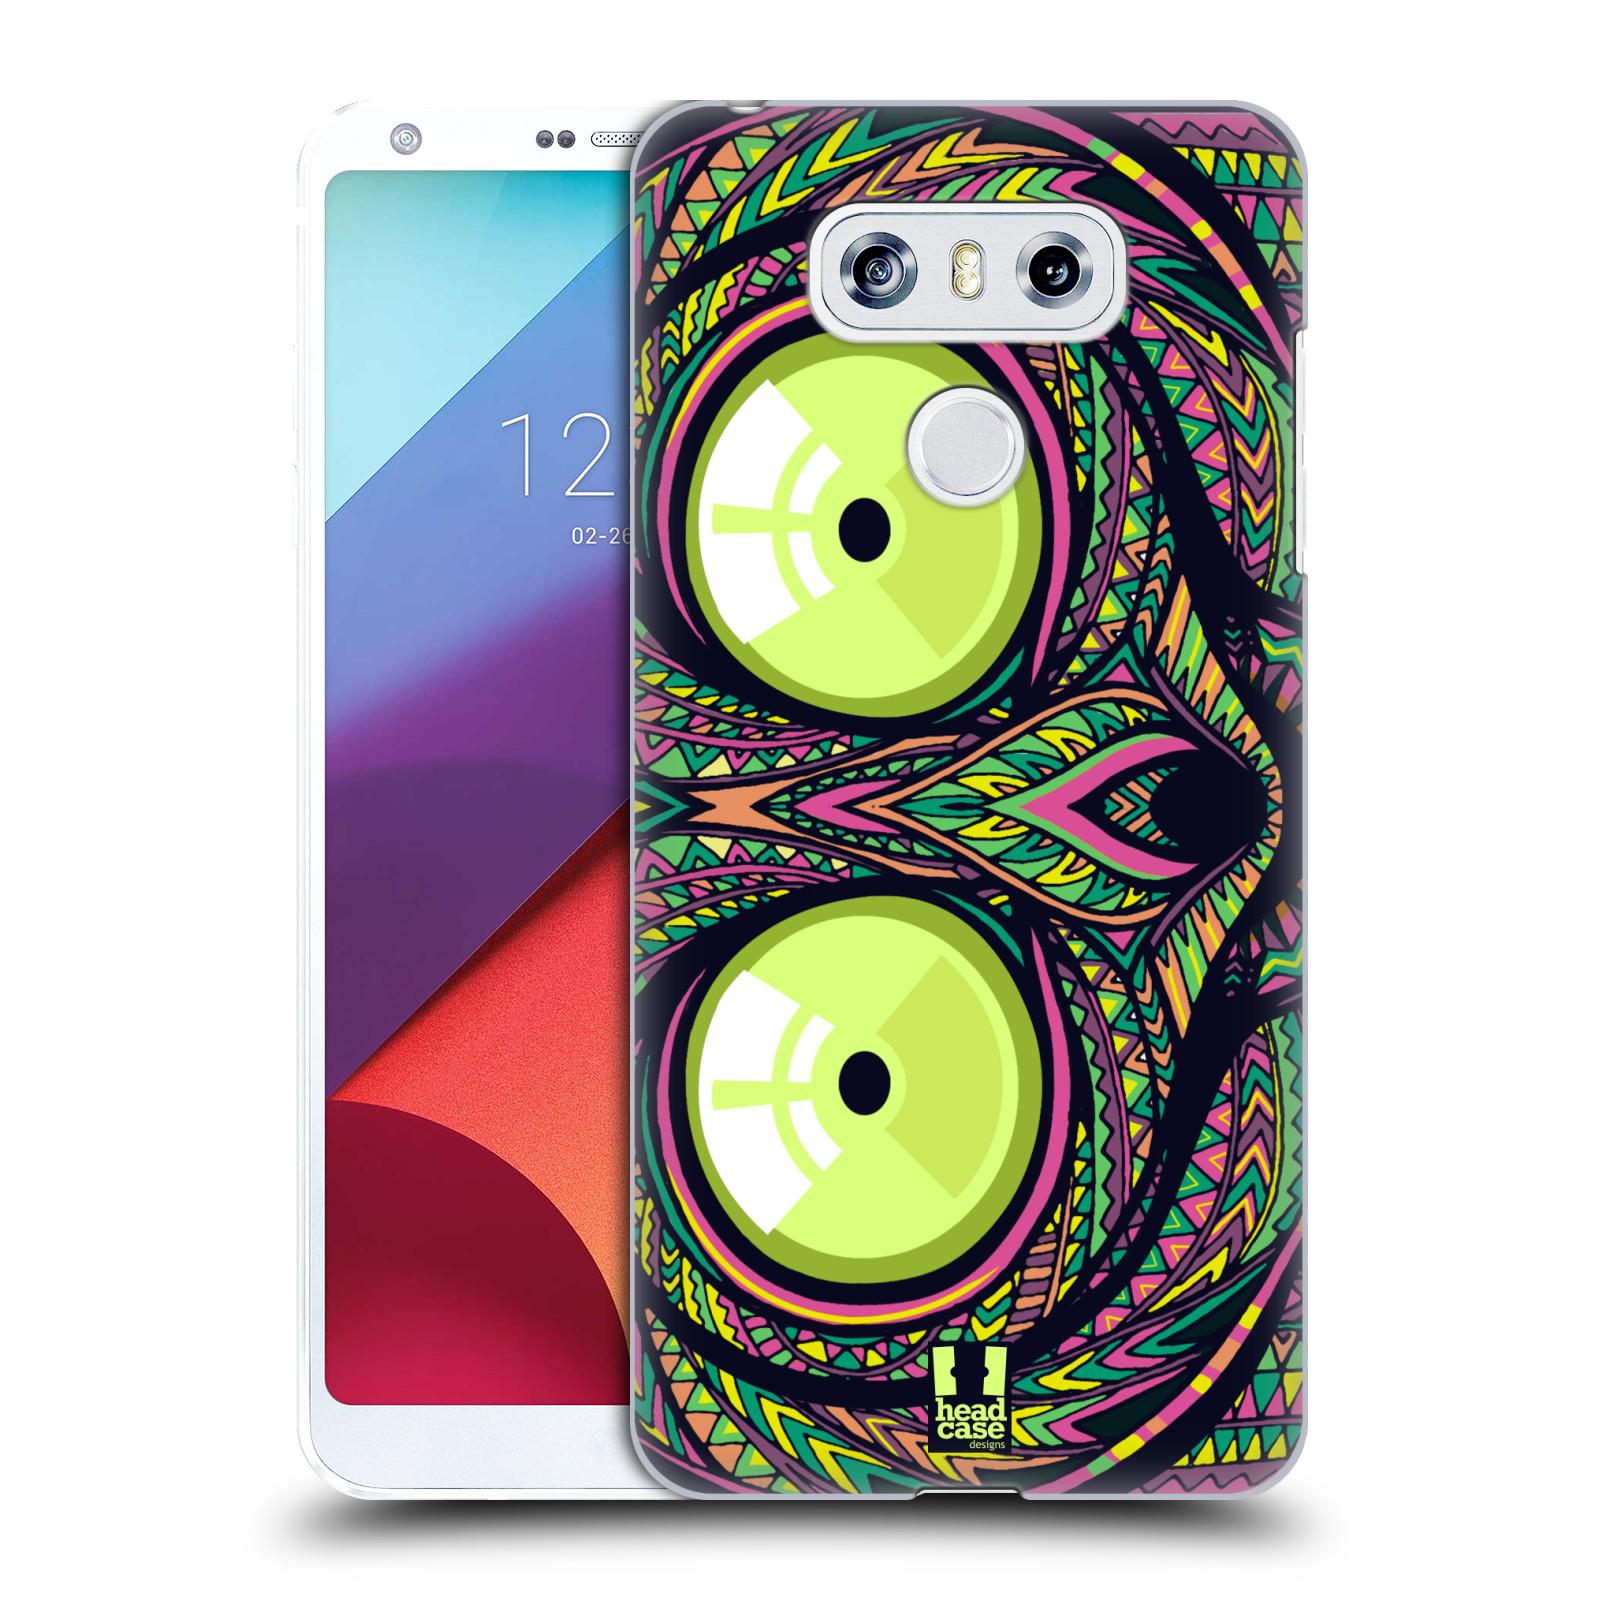 Plastové pouzdro na mobil LG G6 - Head Case AZTEC NÁRTOUN